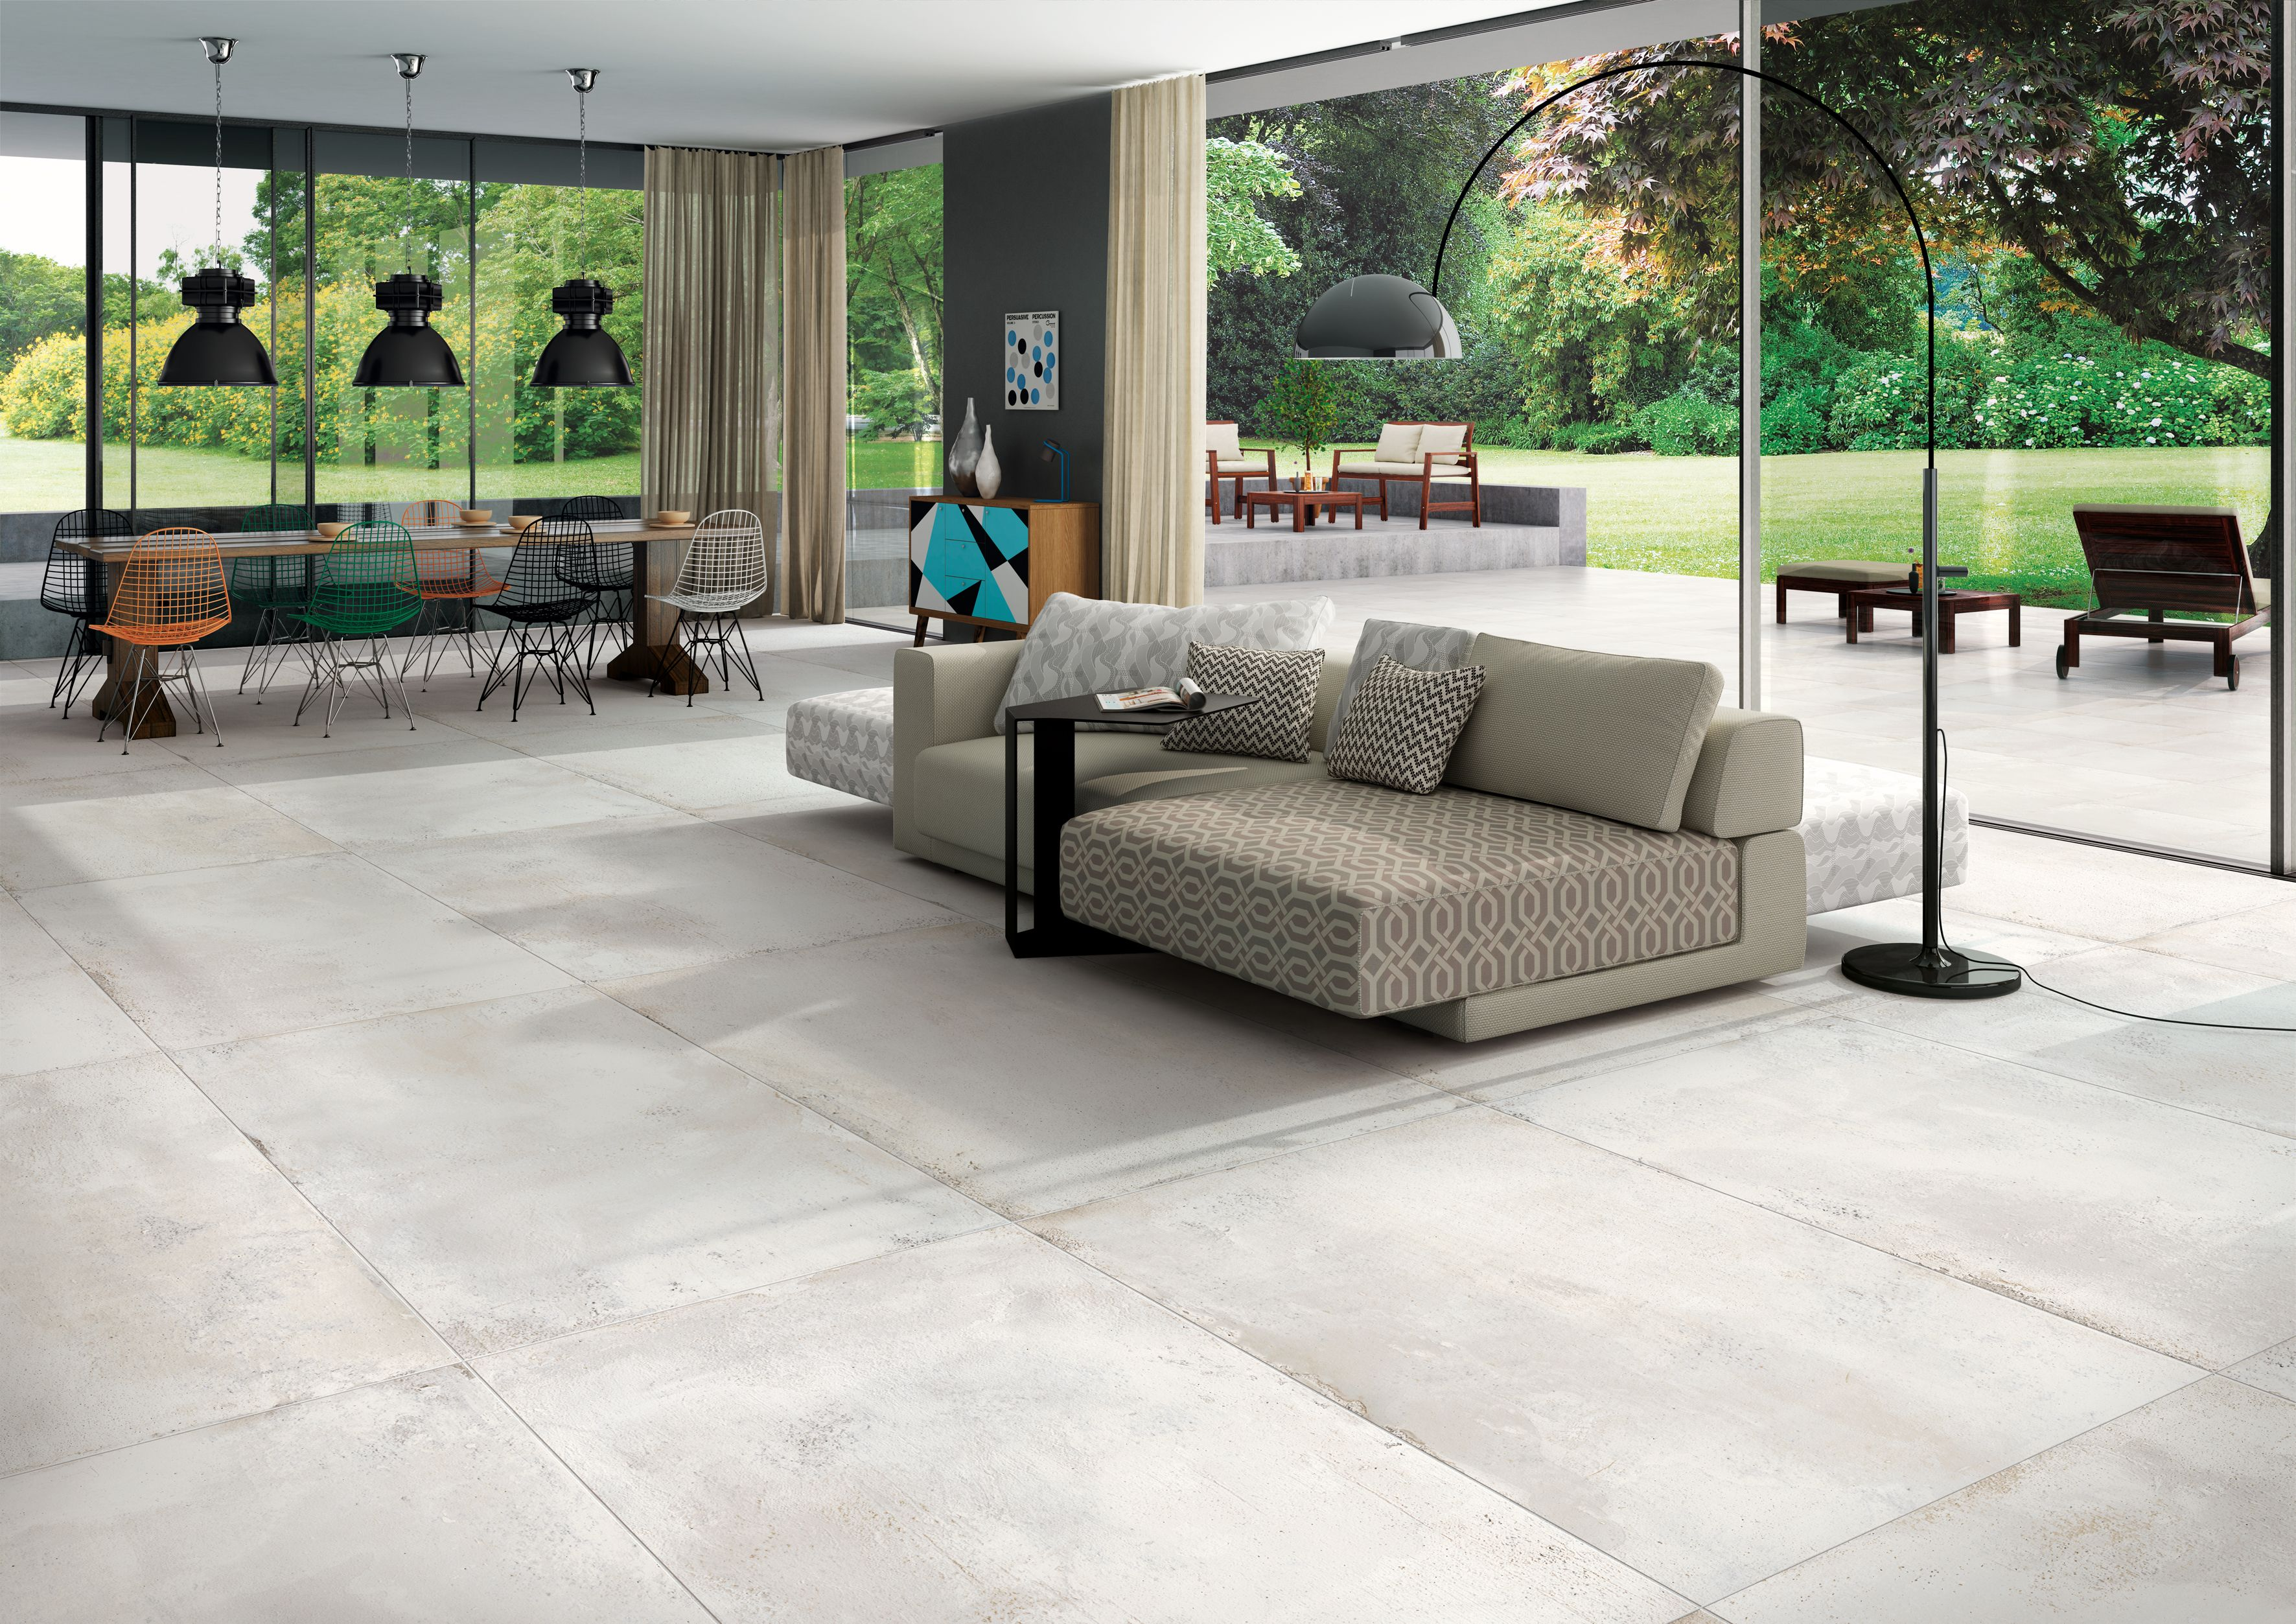 Carrelage Interieur Effet Beton Use 60x120 Blanc Naturel Rectifie